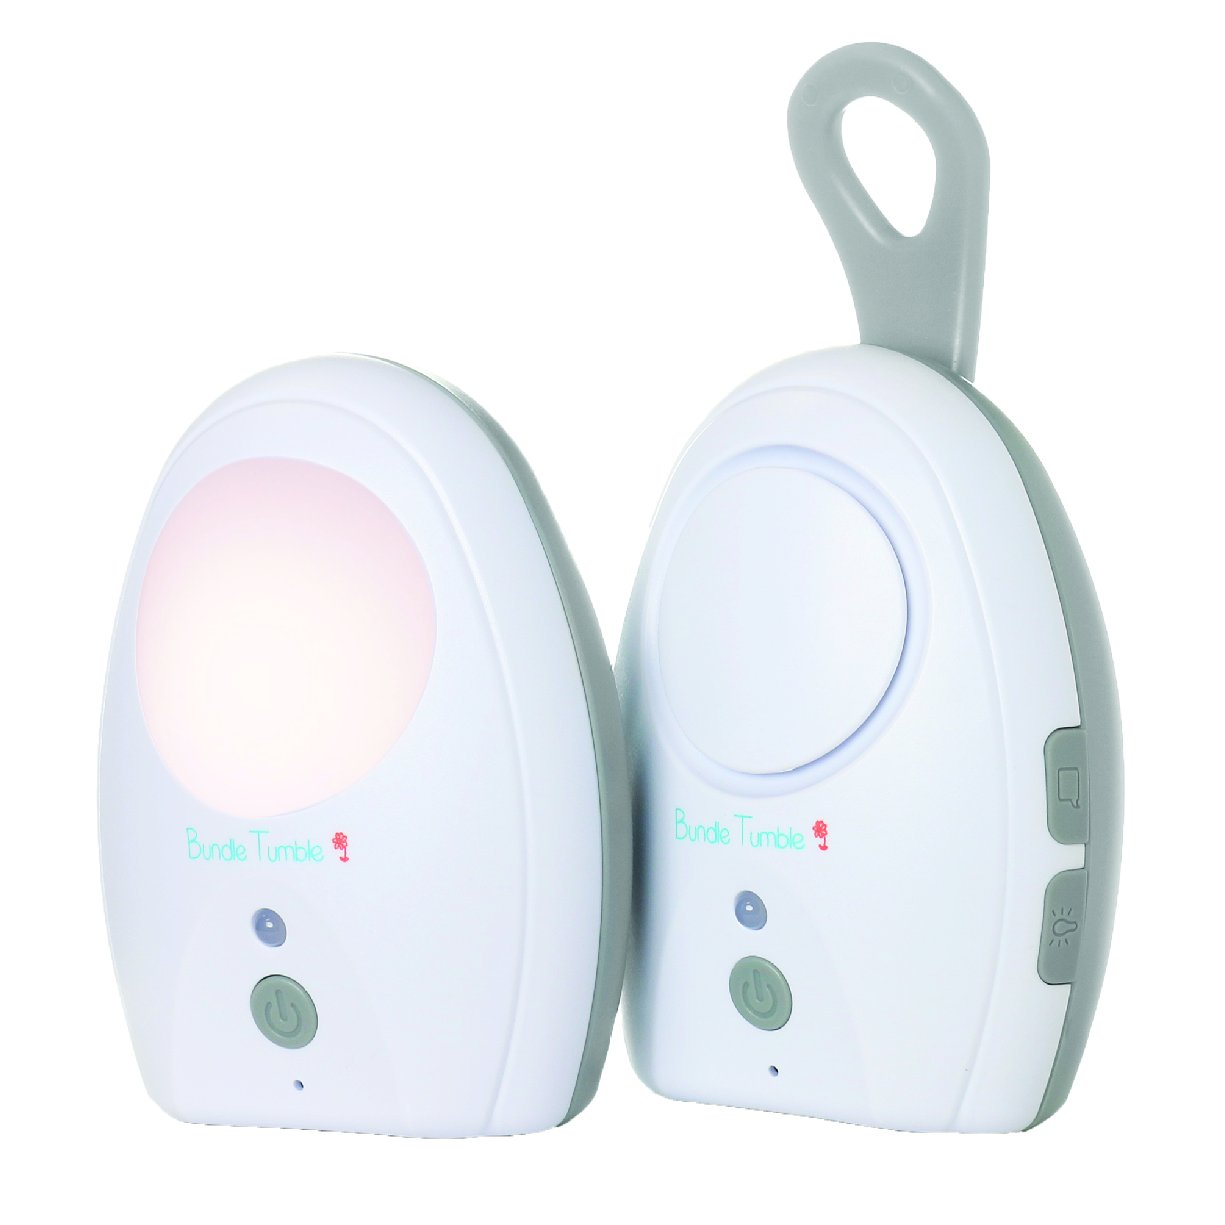 Amazon.com : Wireless Audio Baby Monitor with Two Way Talk